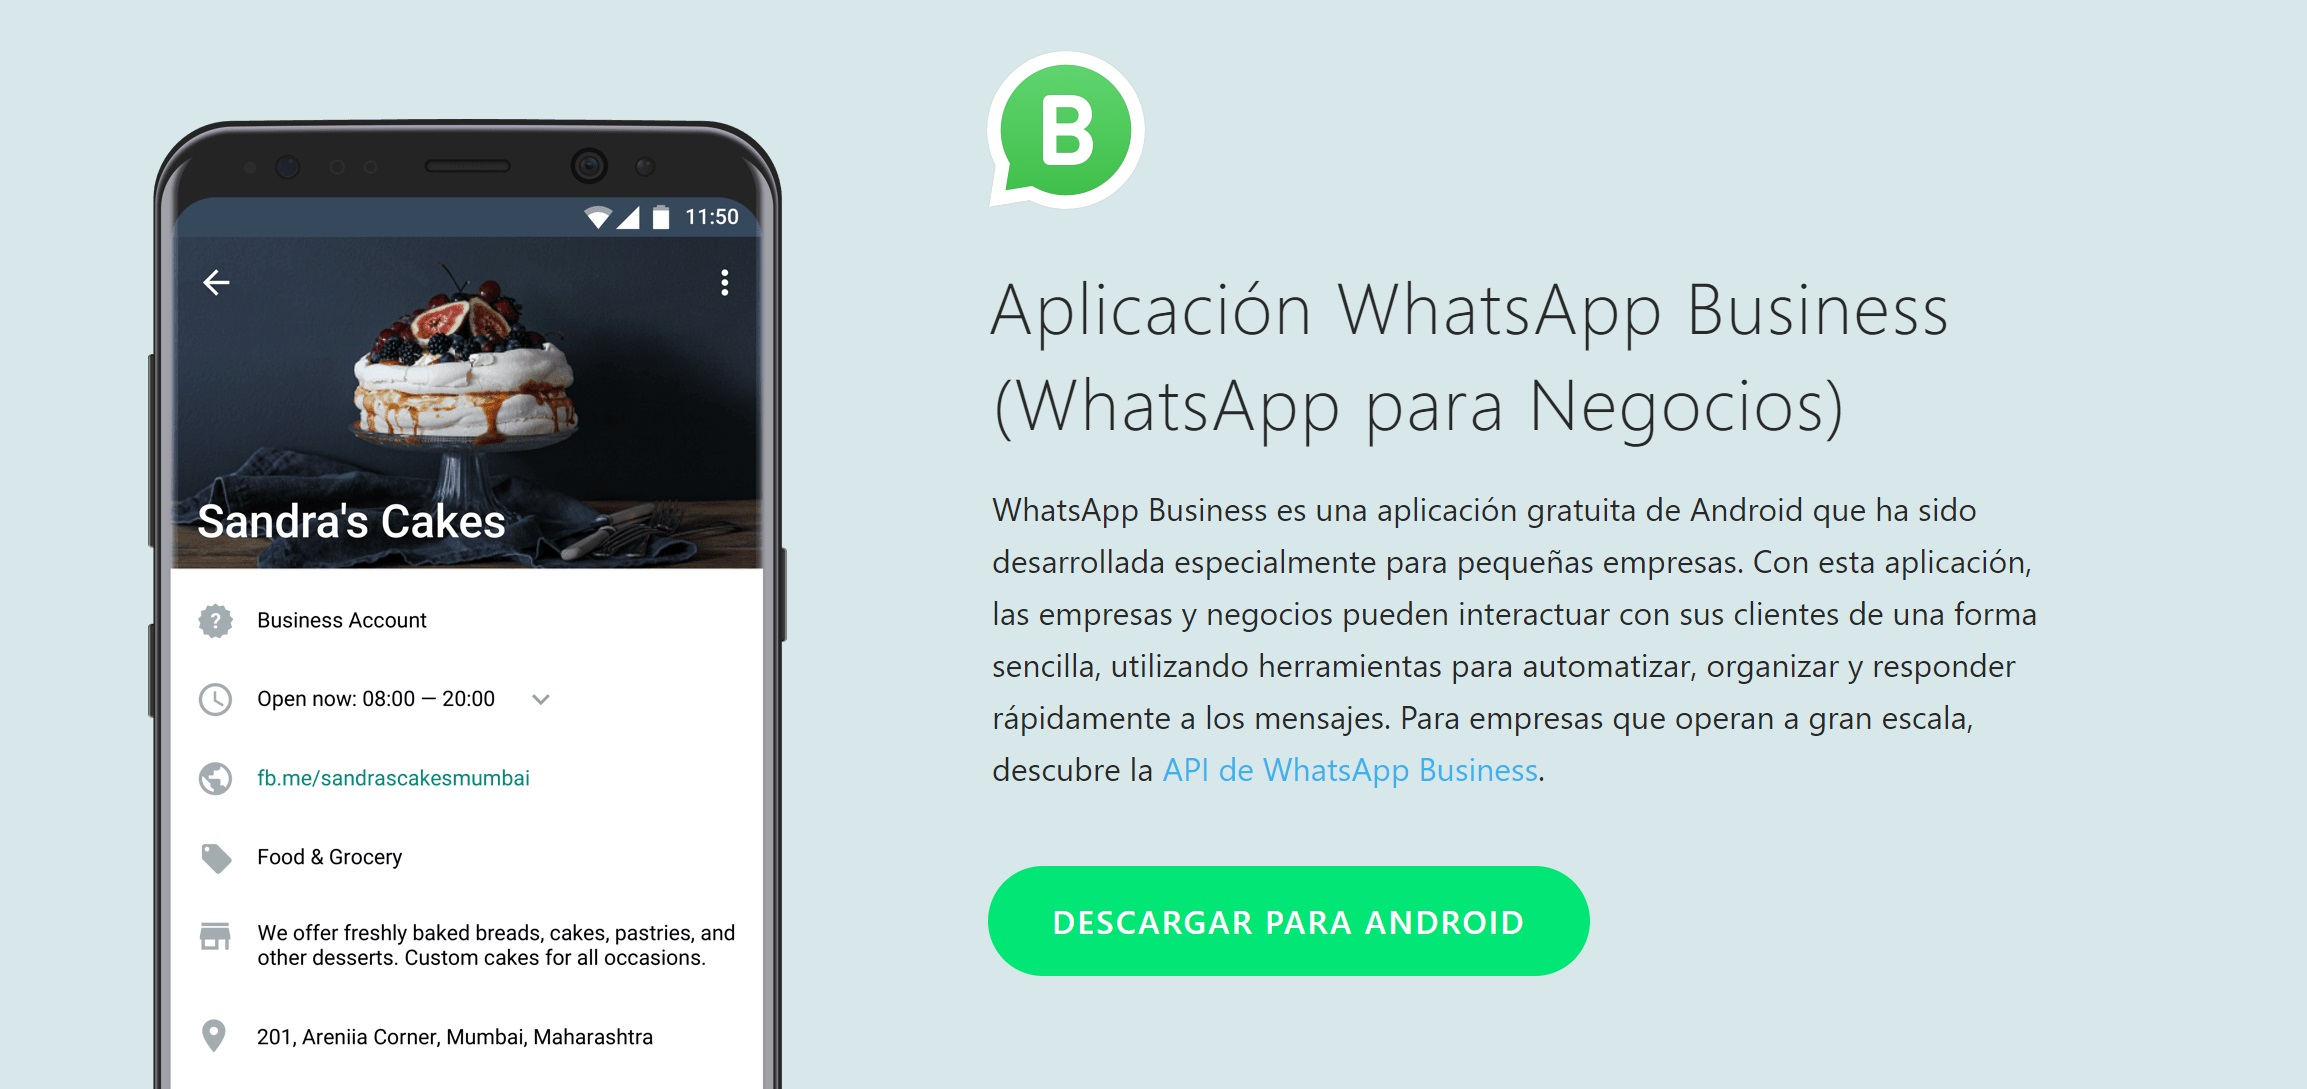 http://www.programapublicidad.com/wp-content/uploads/2019/01/app-whatsapp-business-programapublicidad-muy-grande.jpg